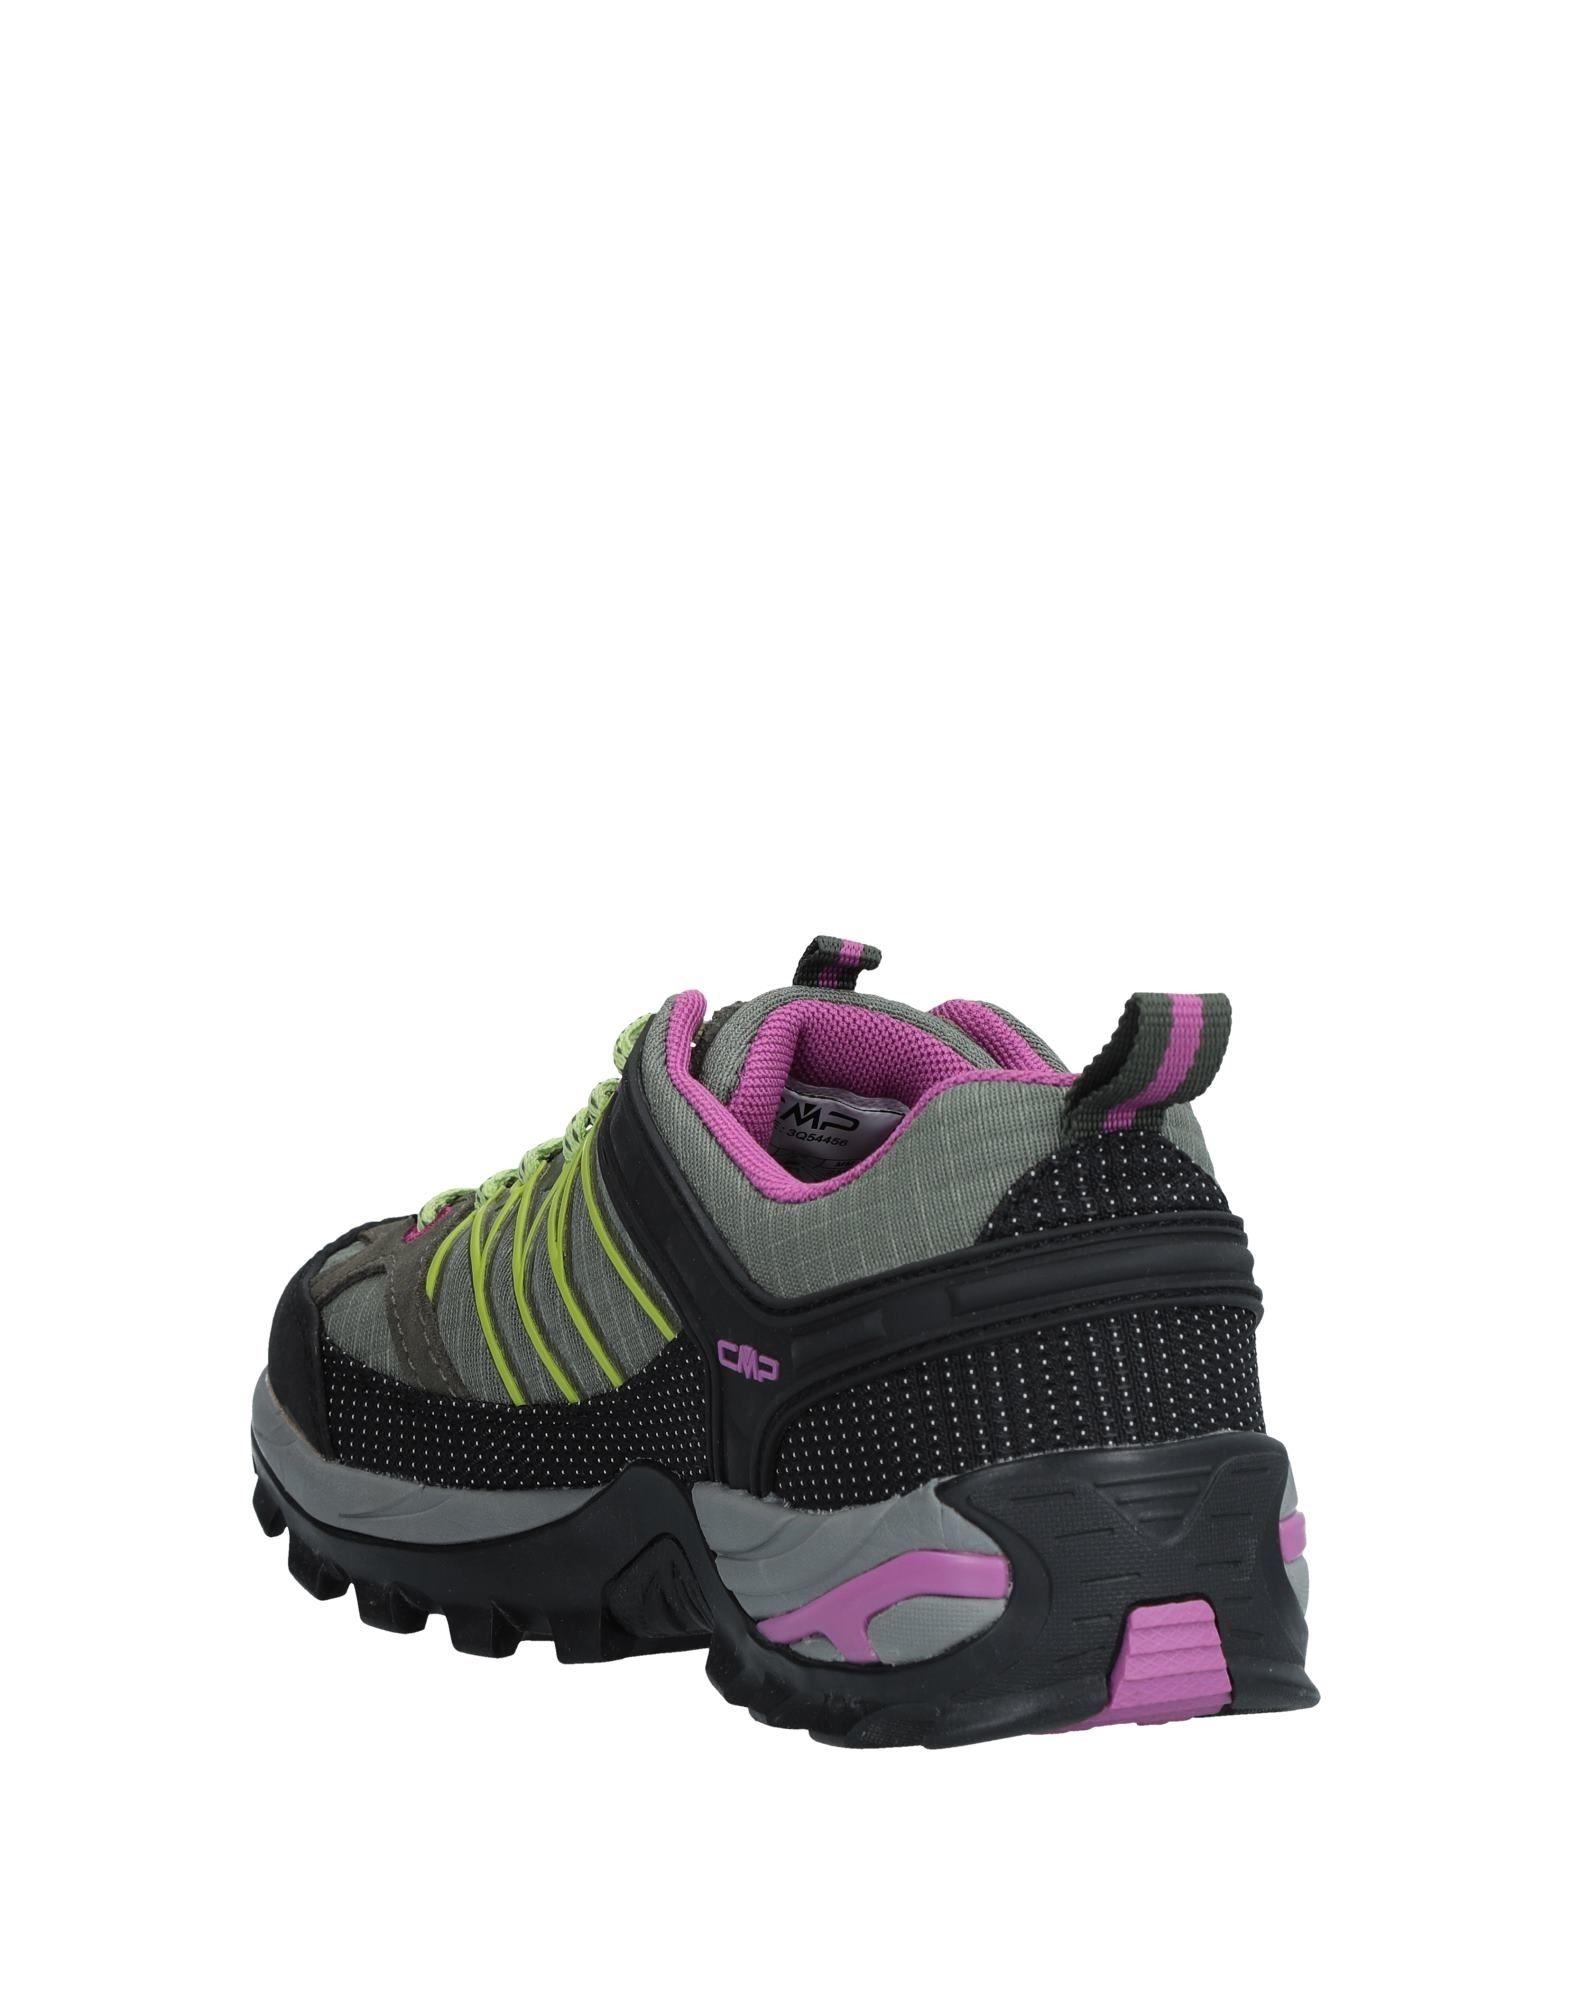 Cmp By F.Lli Campagnolo Sneakers Damen  11537437MM Schuhe Gute Qualität beliebte Schuhe 11537437MM df5180